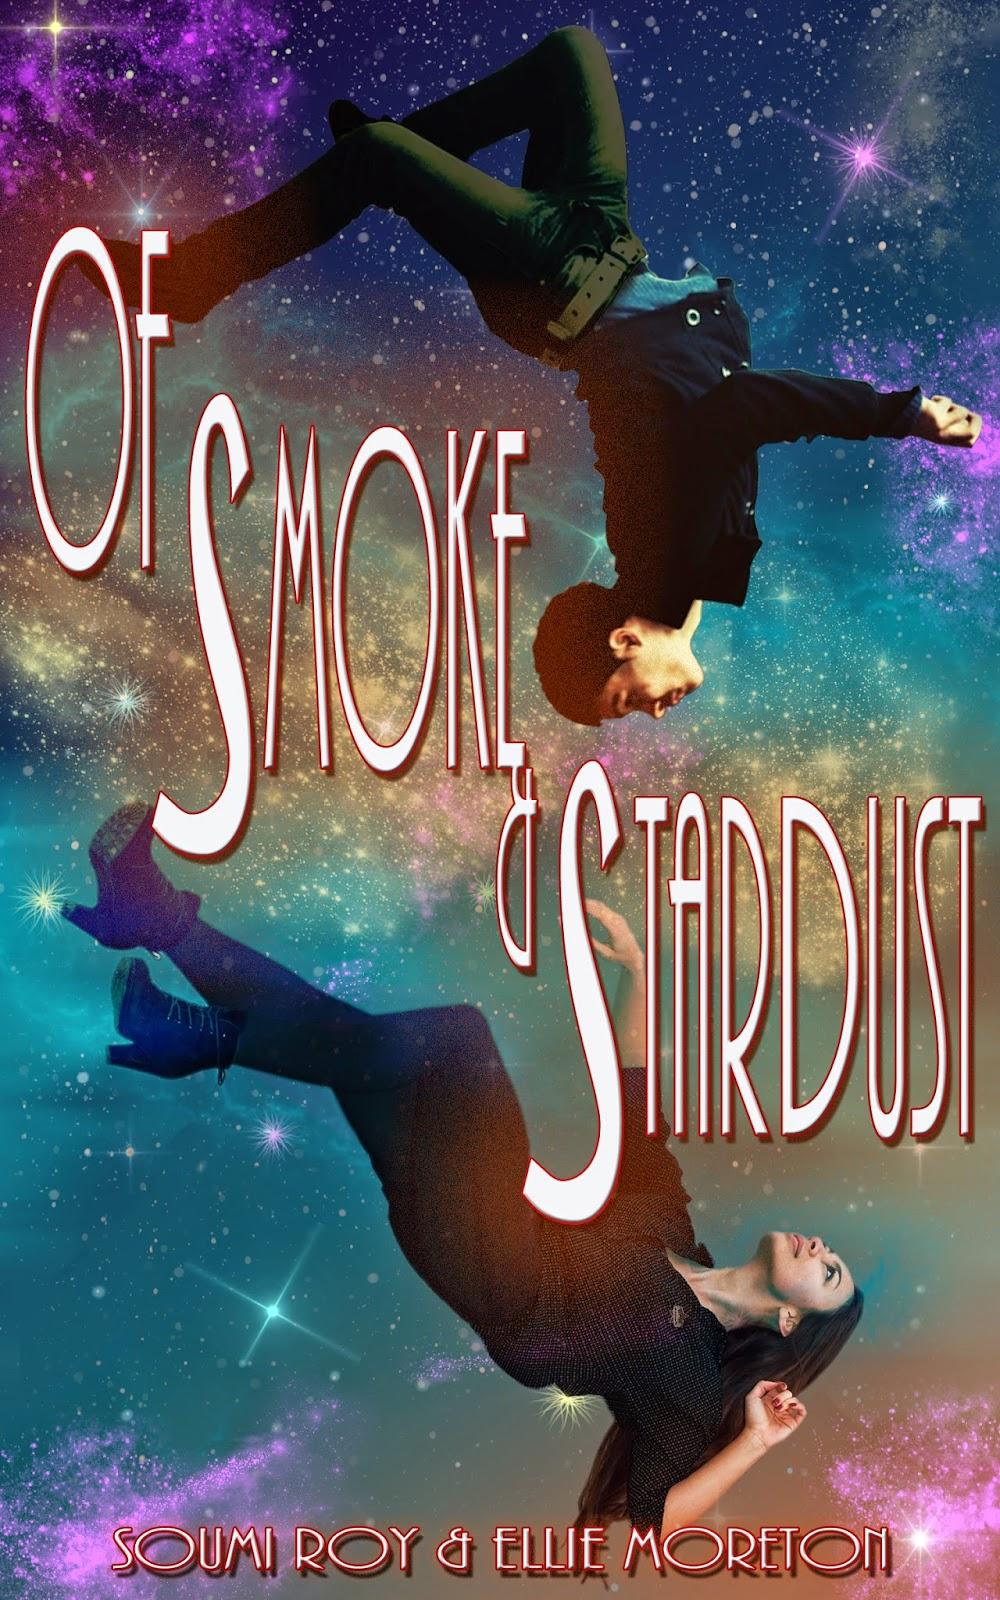 http://www.wattpad.com/myworks/31290385-of-smoke-and-stardust